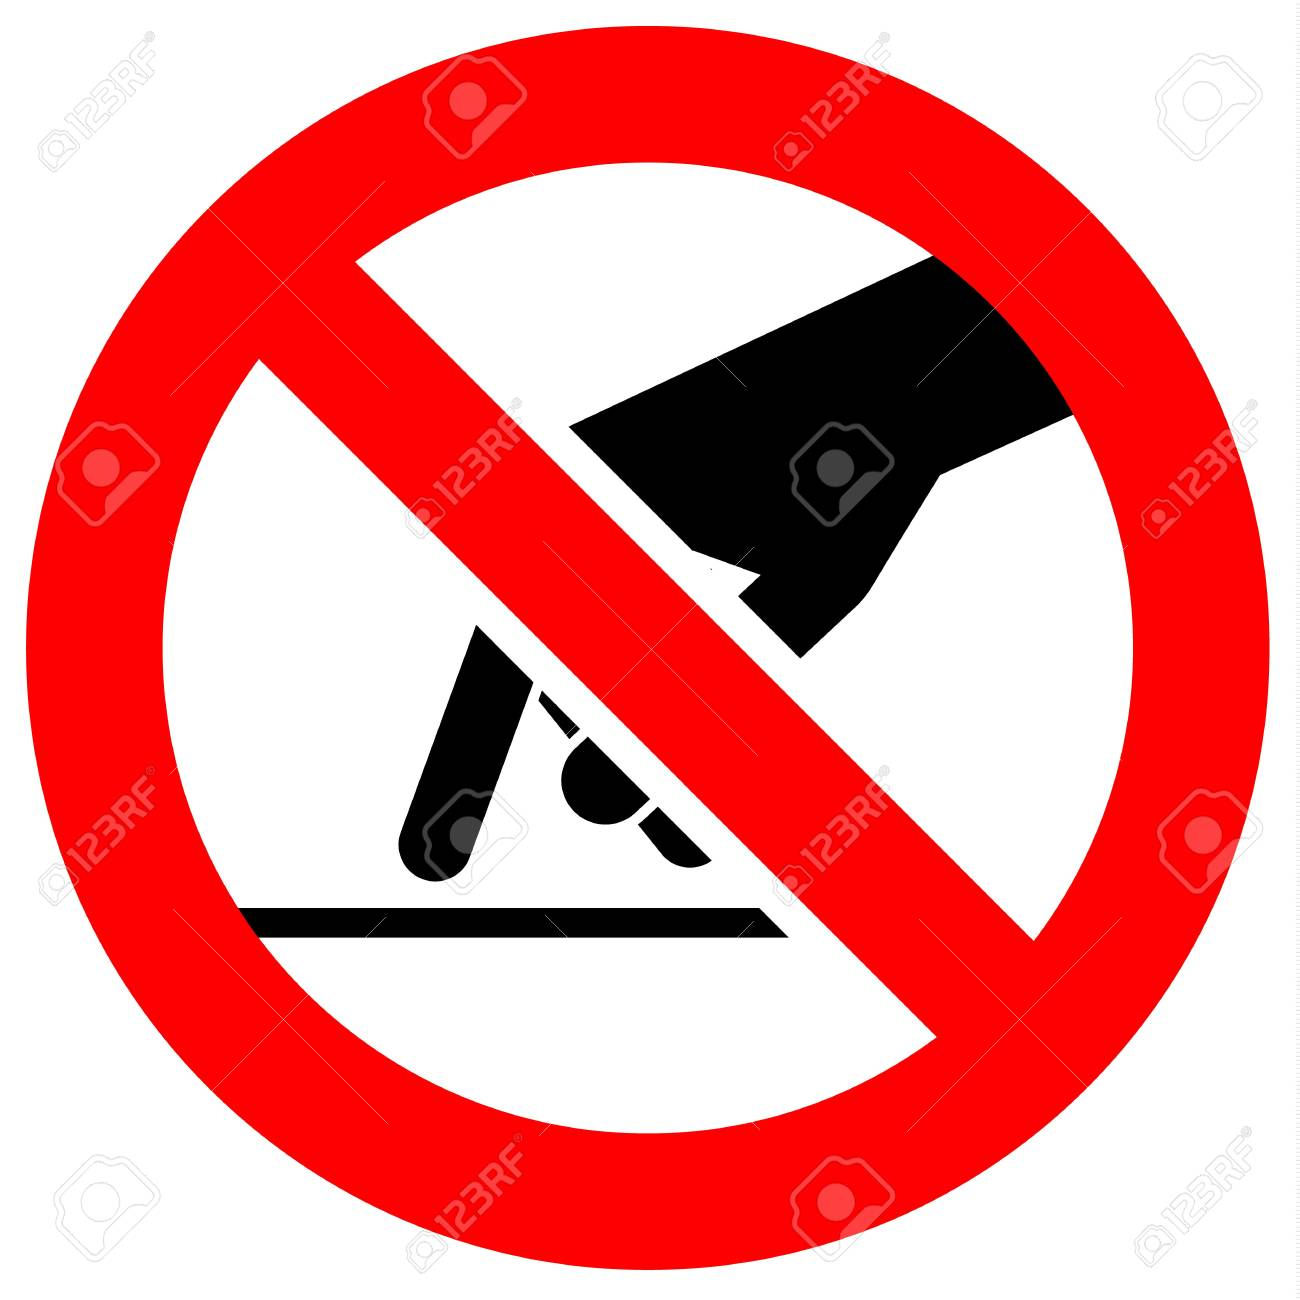 Prohibition sign. Black forbidden symbol in red round shape - 95605093